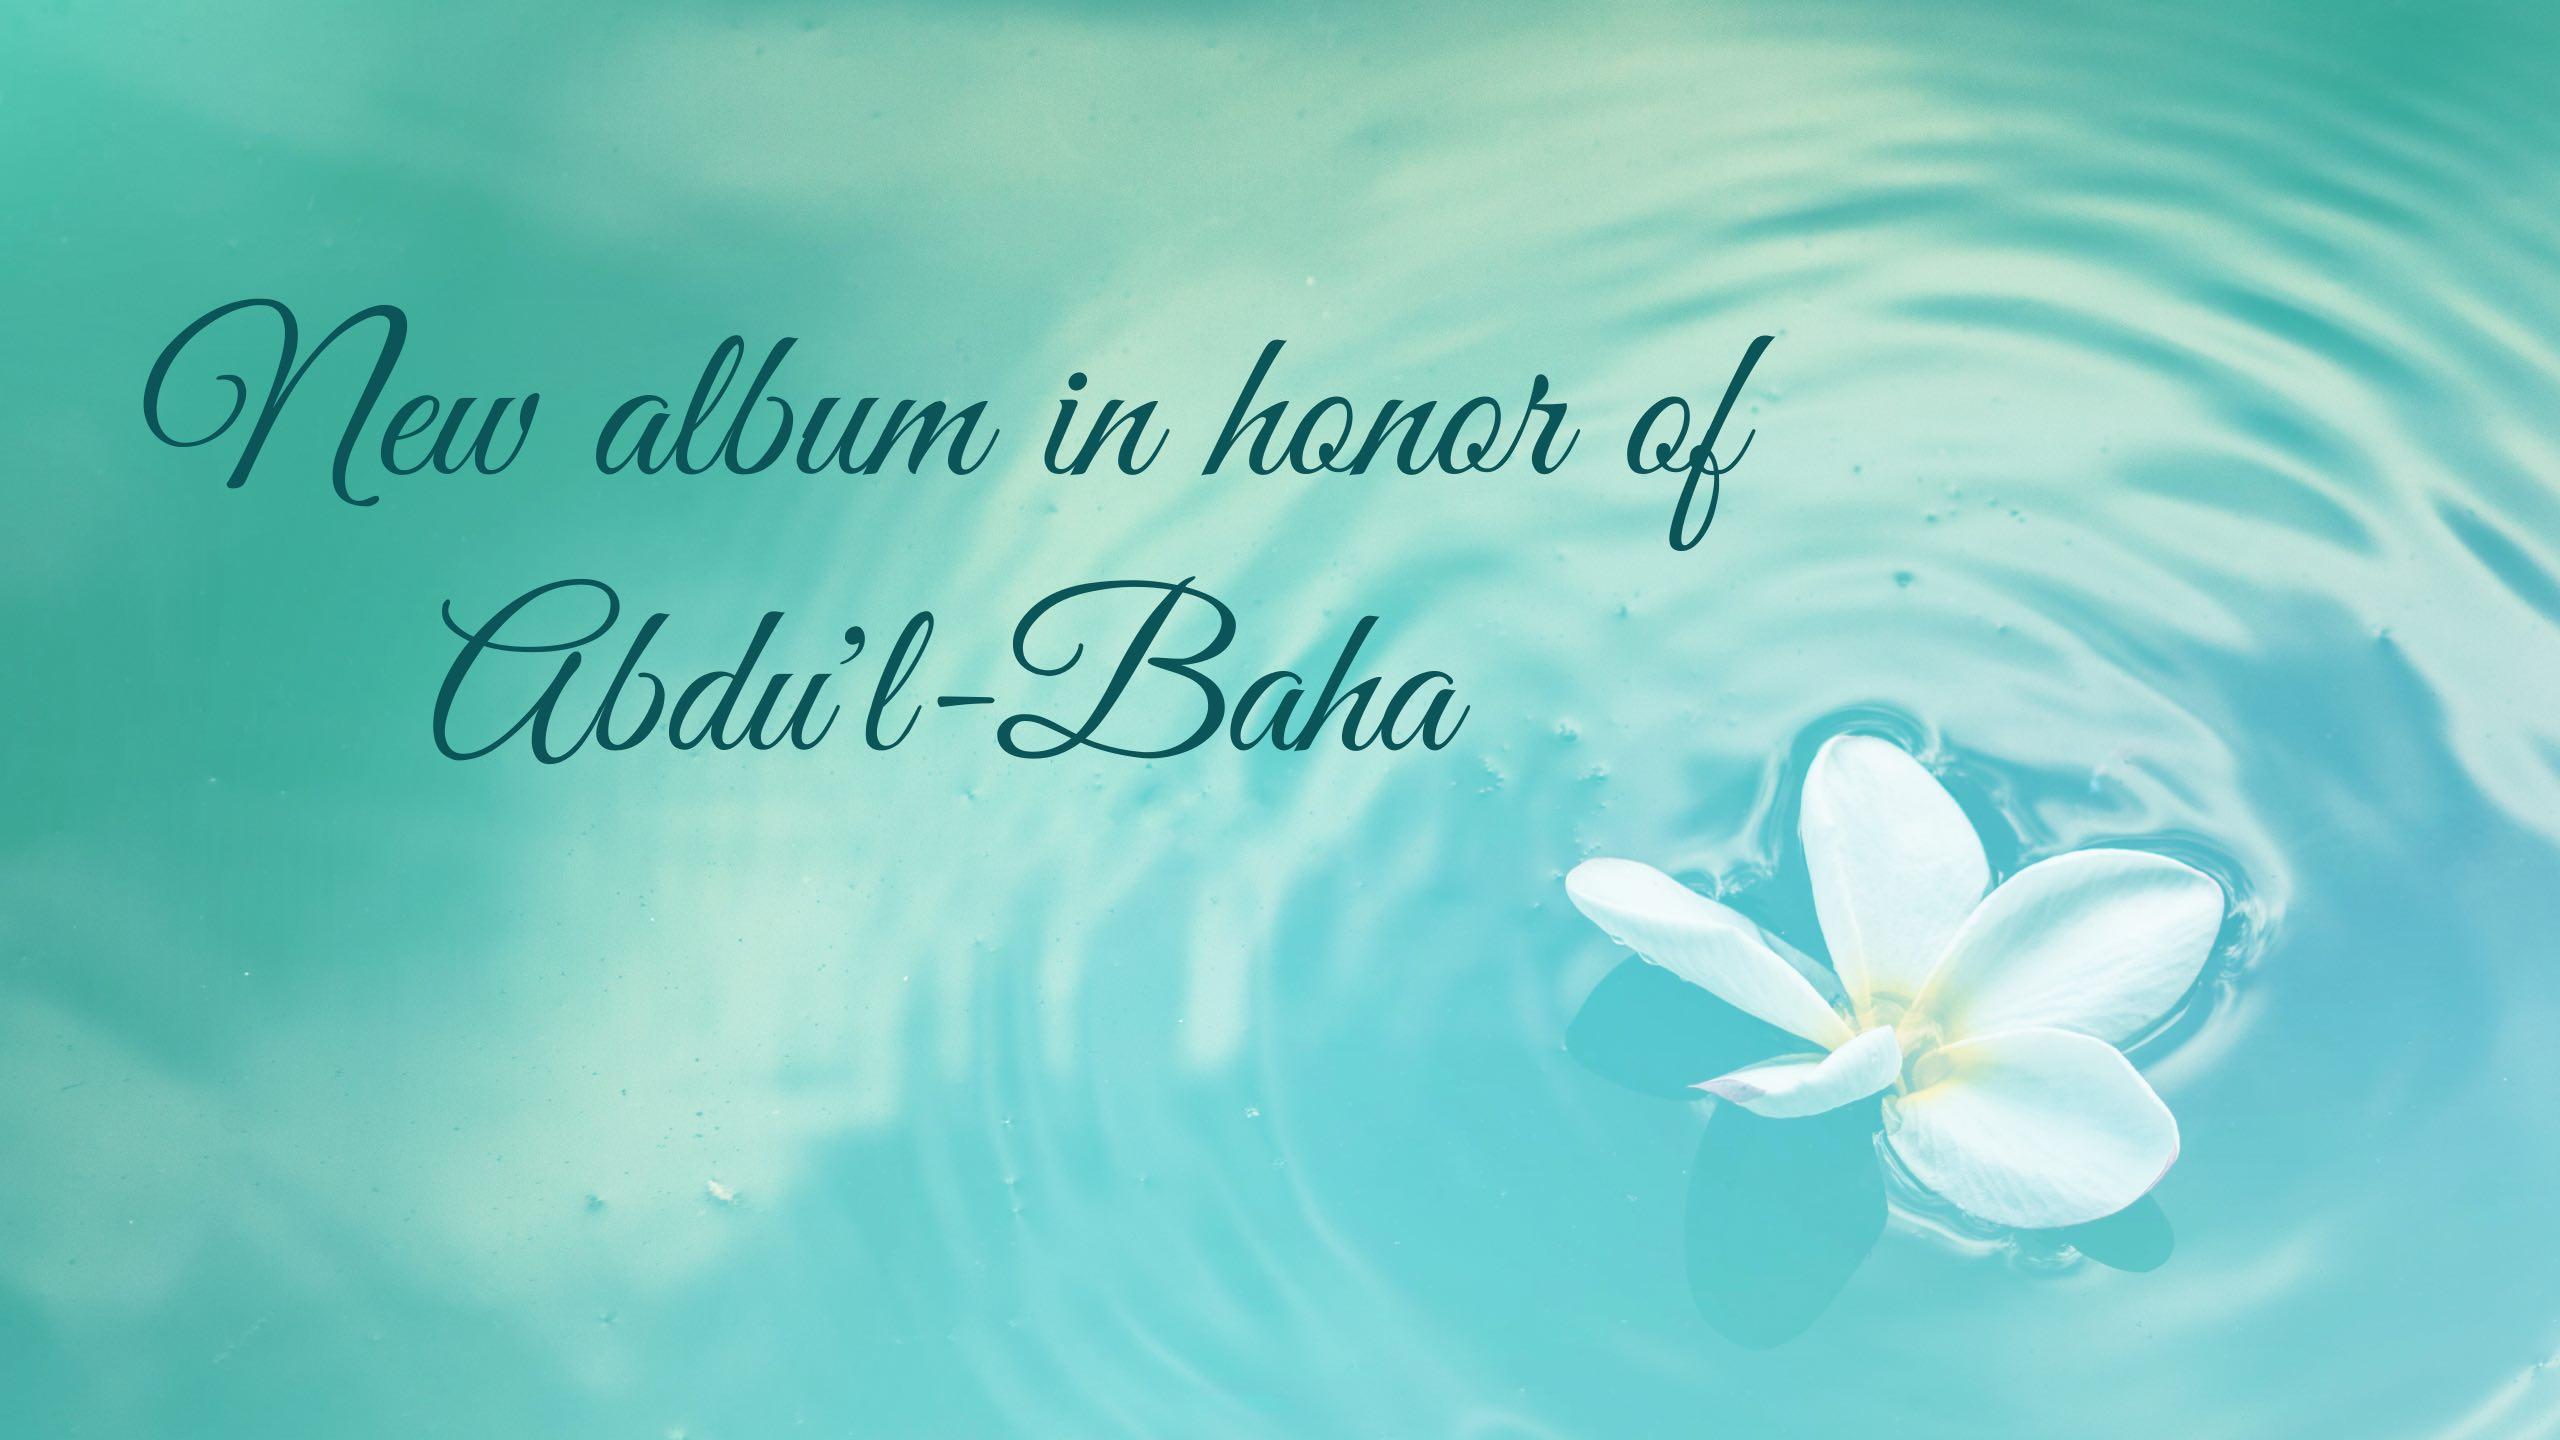 News on music album in honor of Abdu'l-Baha